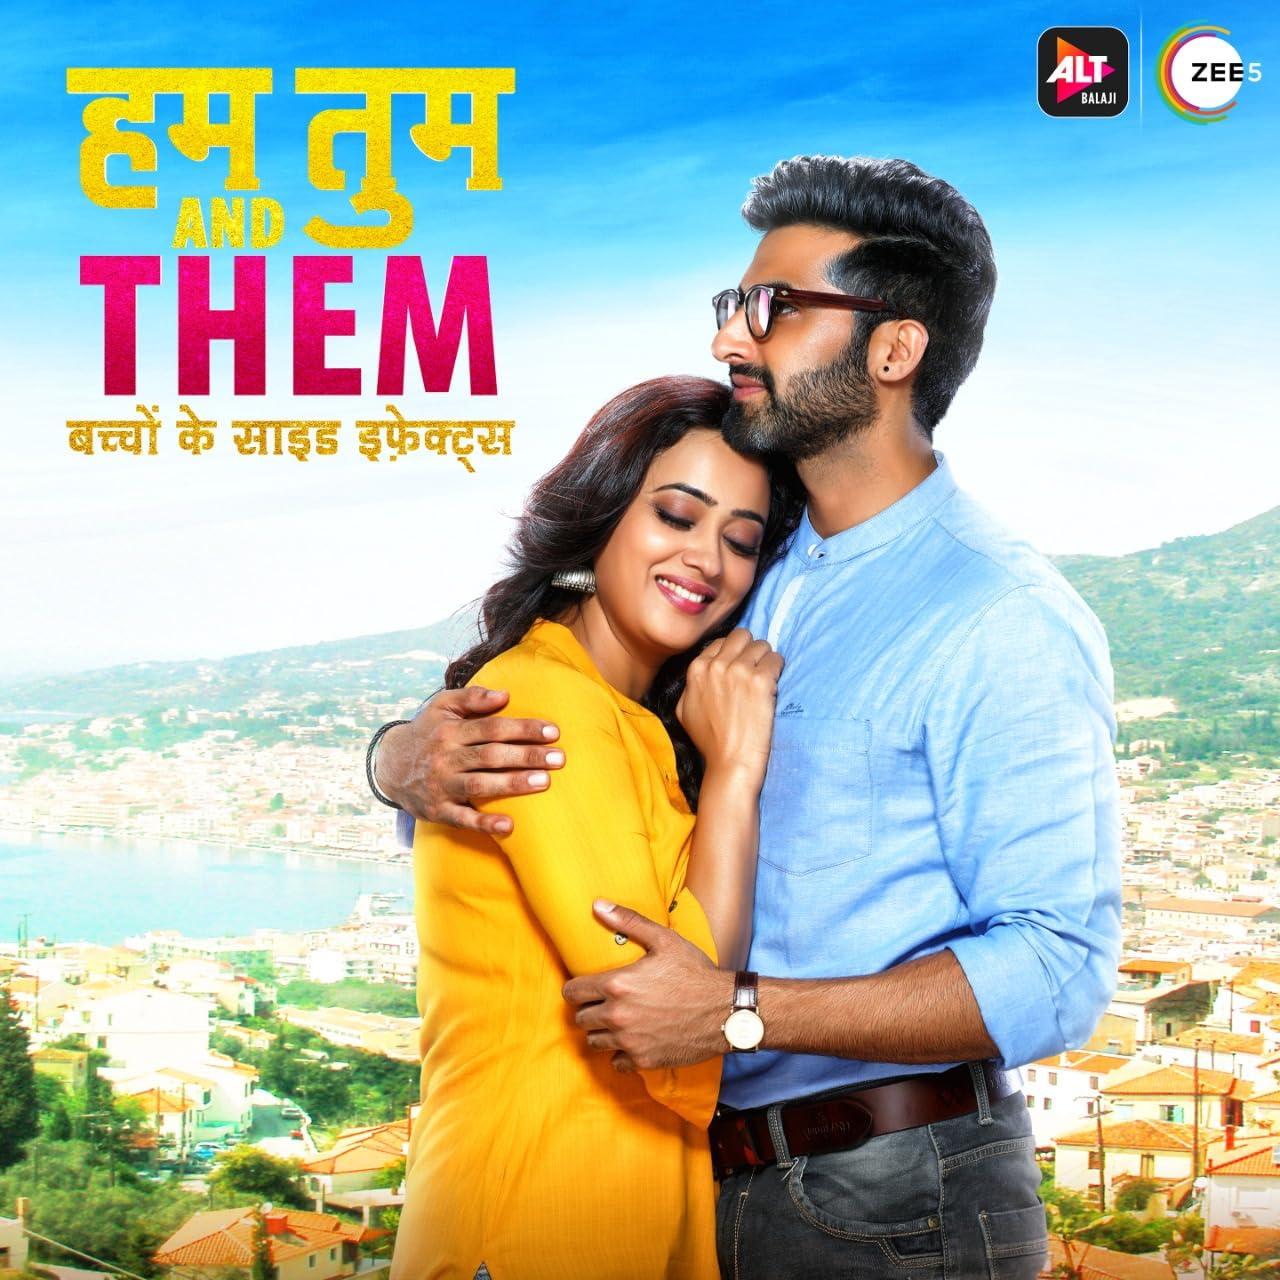 Hum Tum and Them (2019) Season 1 (AltBalaji)